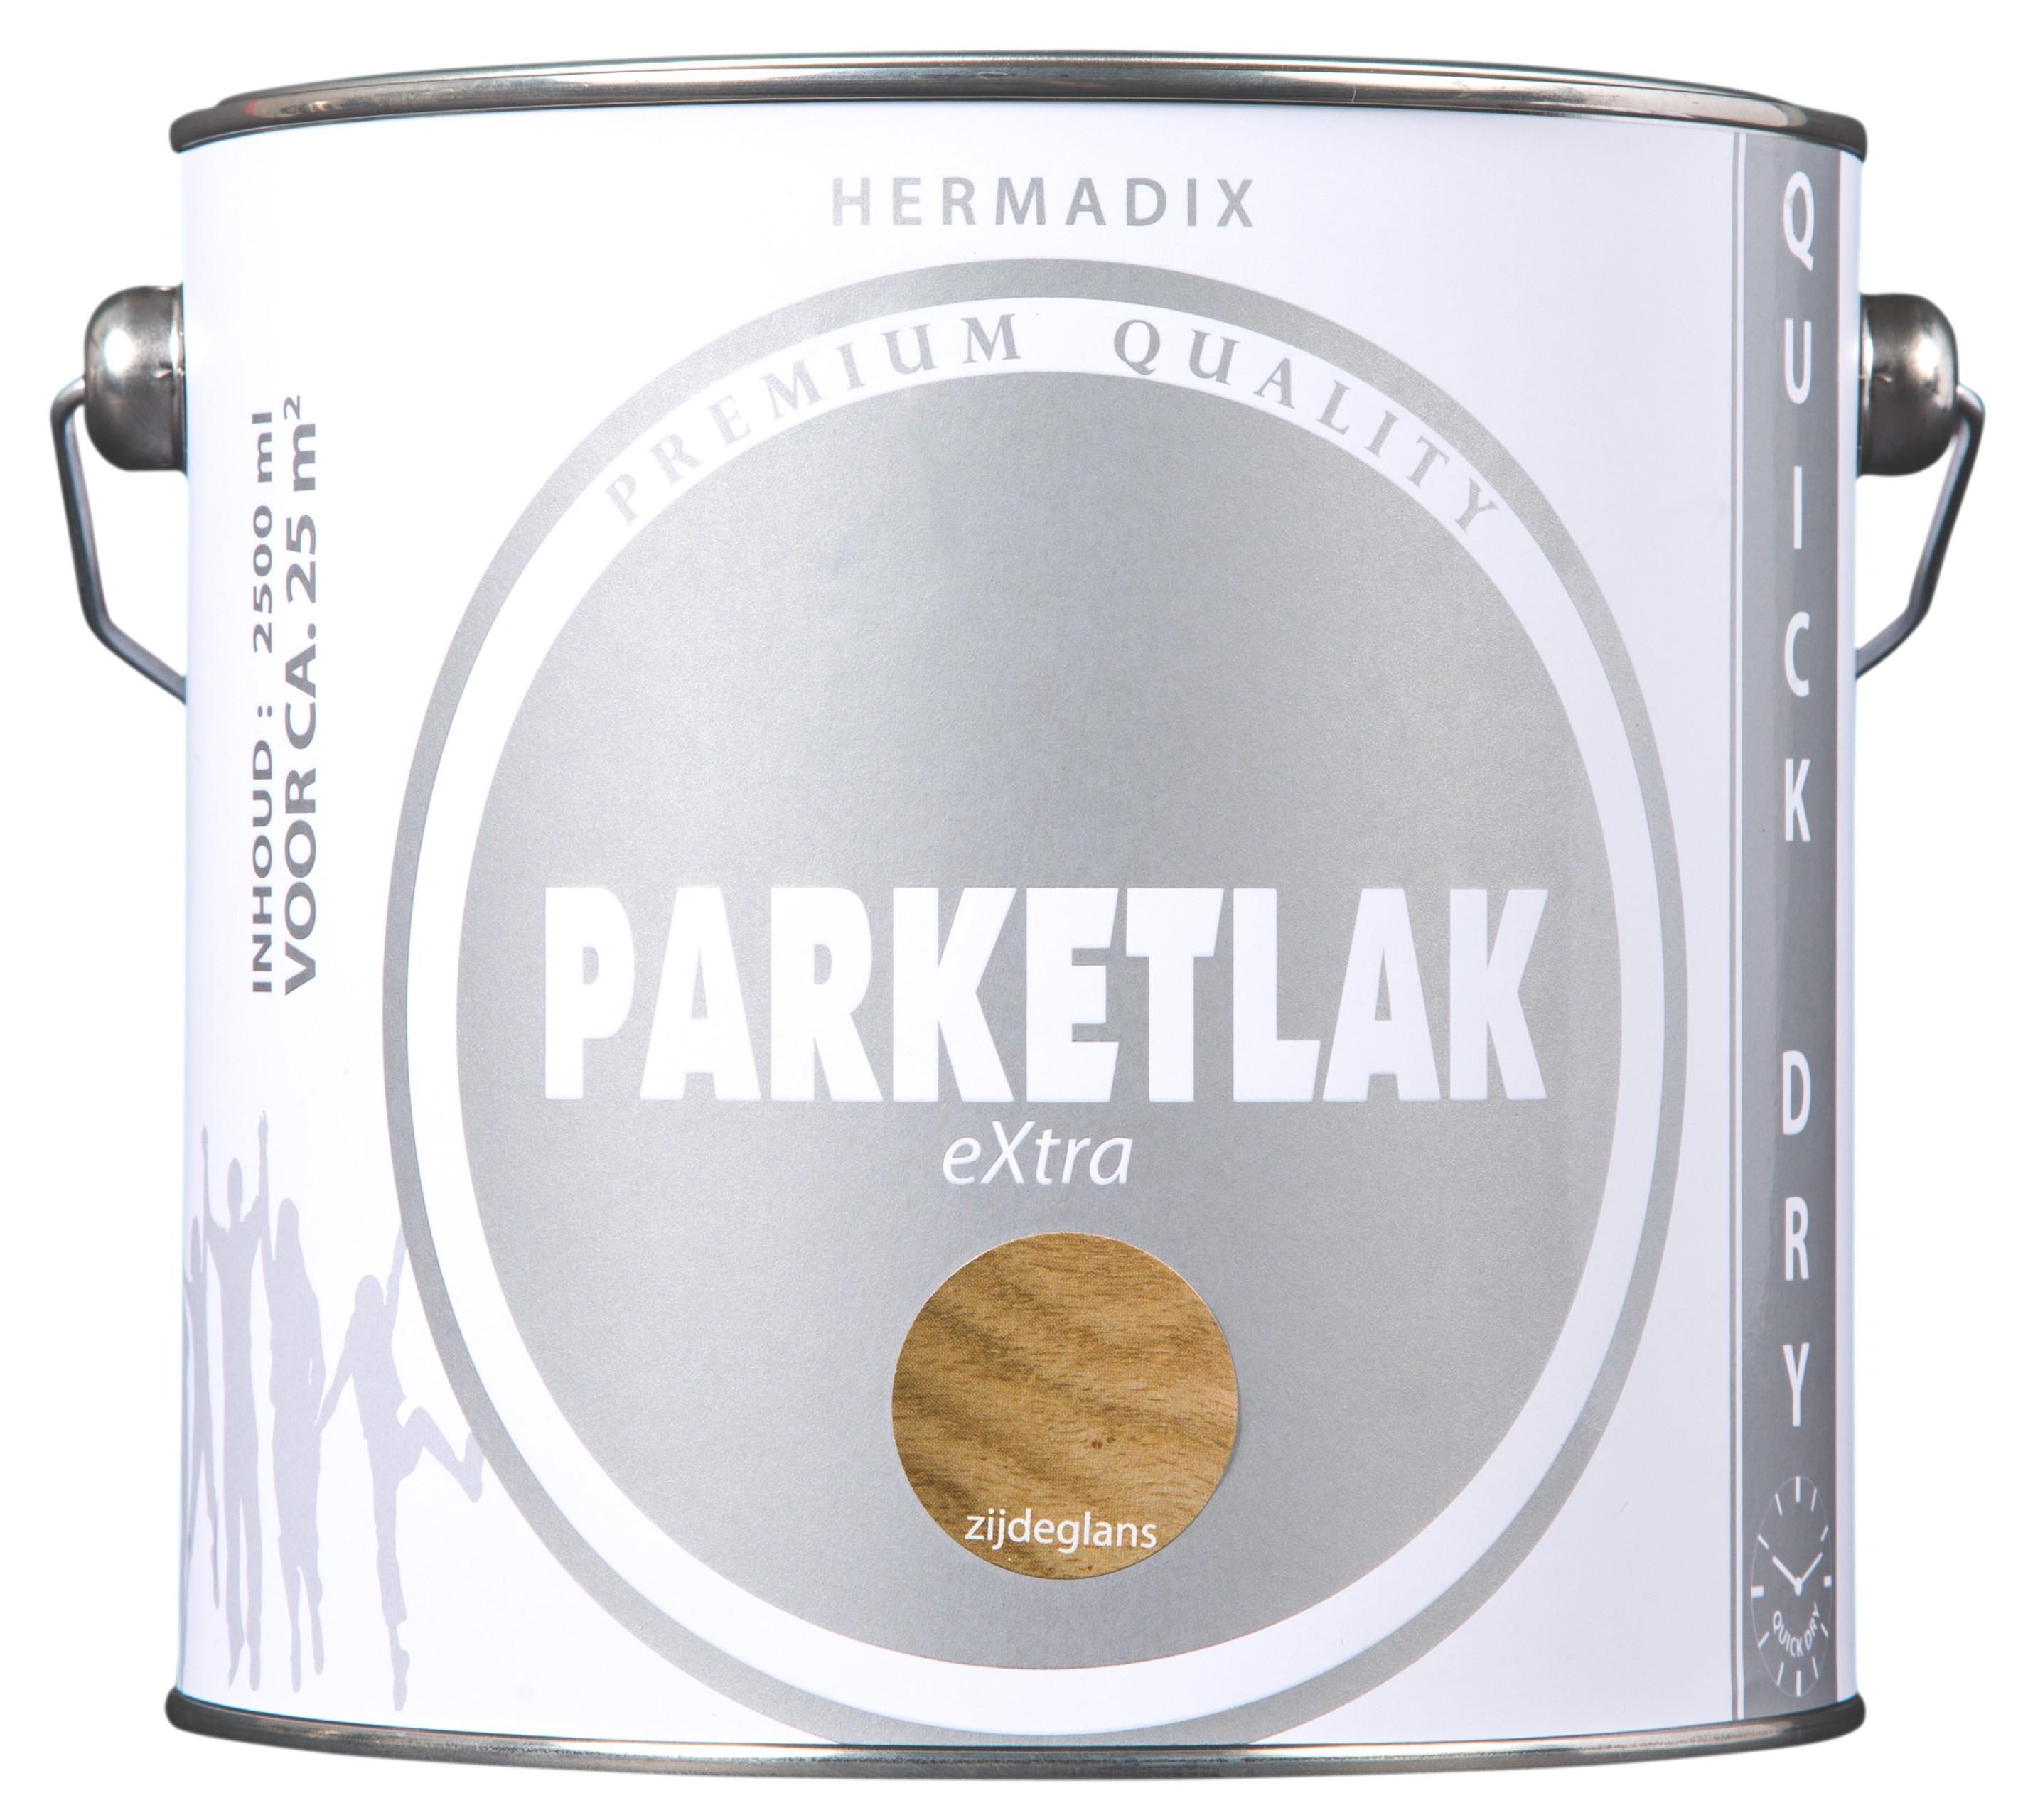 Hermadix Parketlak EXtra  2,5 Liter